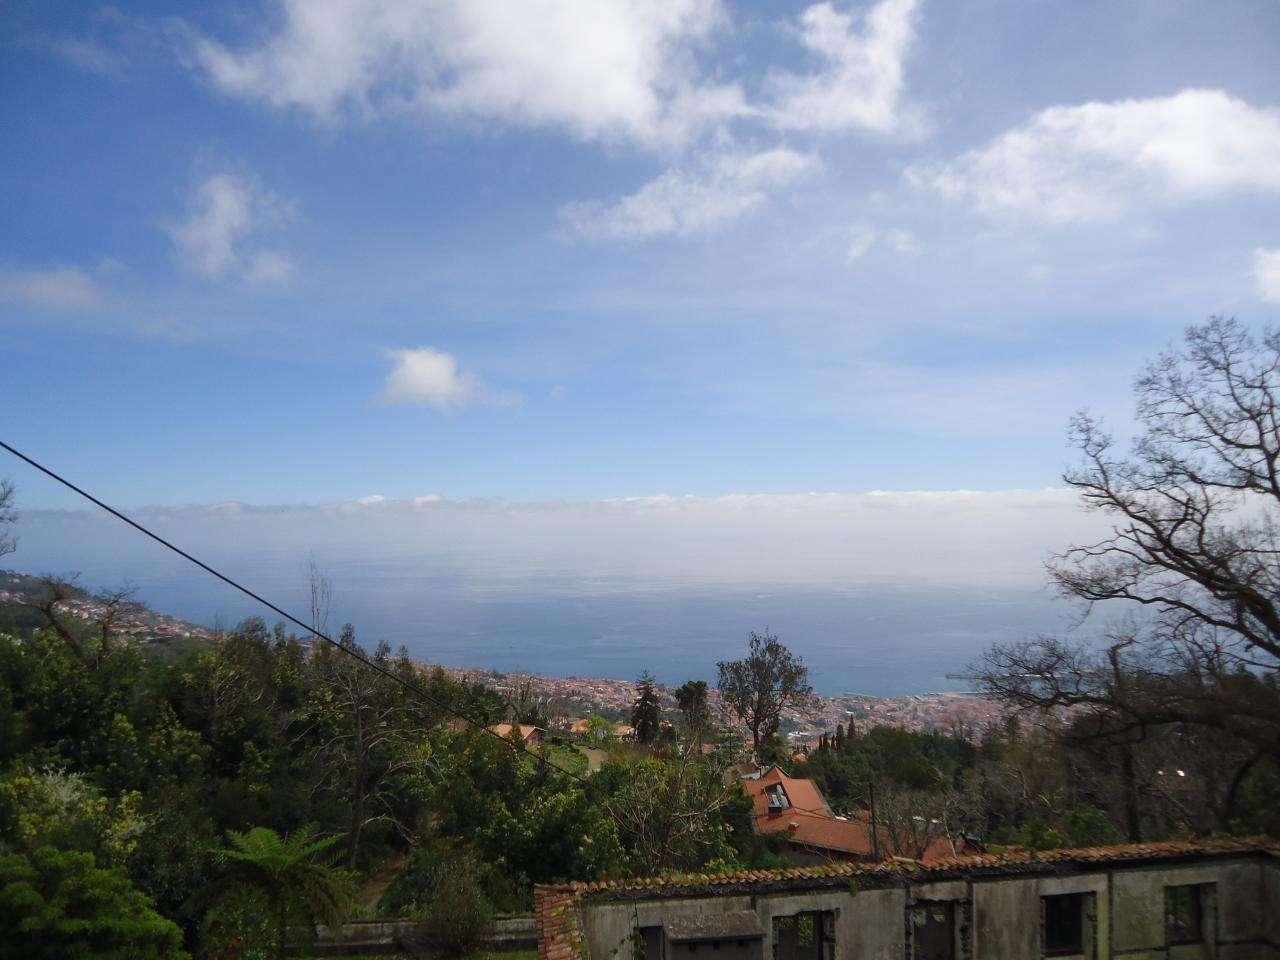 Moradia para comprar, Monte, Funchal, Ilha da Madeira - Foto 3